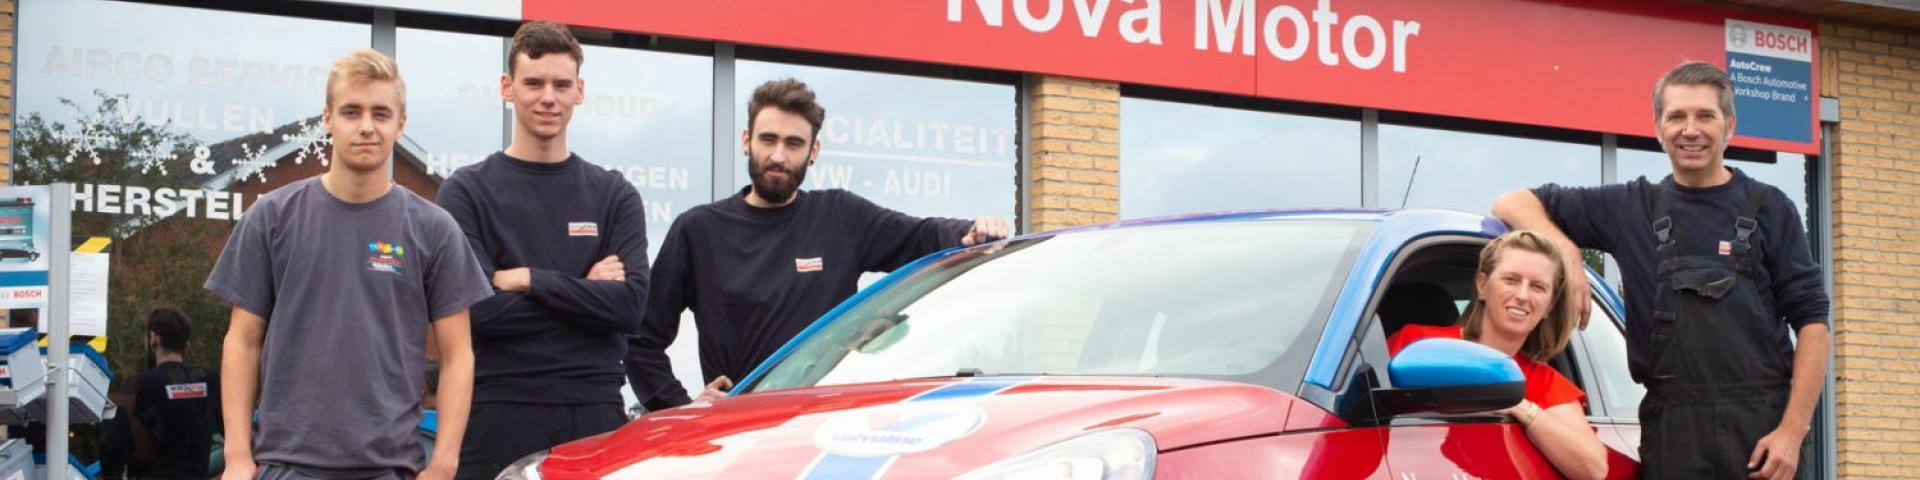 Nova Motor AutoCrew team